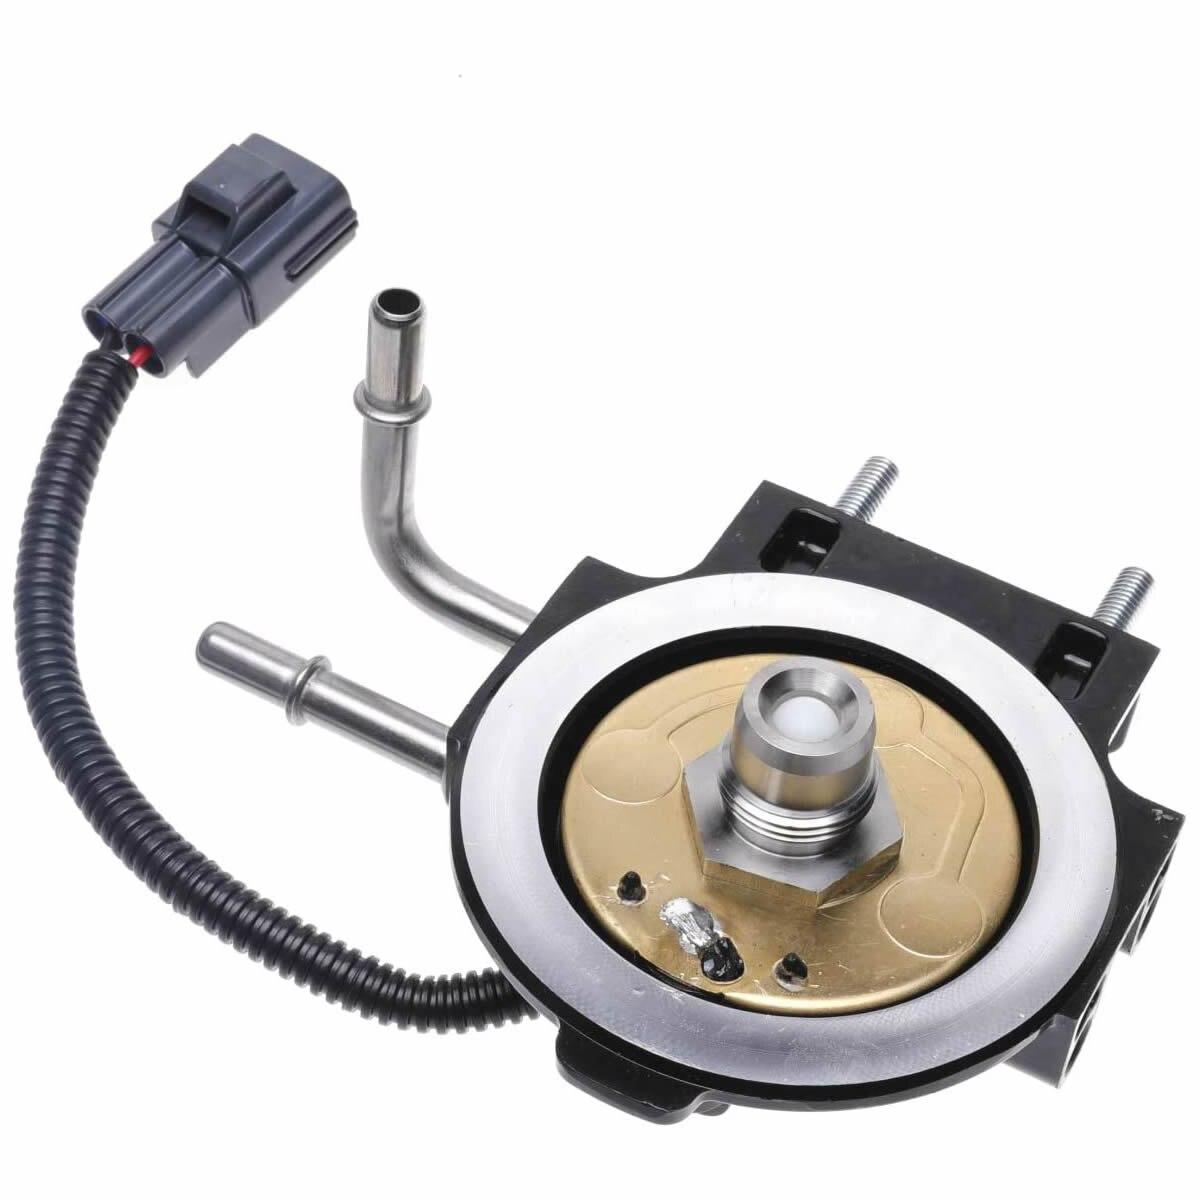 Cabeça de filtro de combustível ifjf com calefator para 68197867aa ram 2500 3500 4500 5500 6.7l 2013-2018 de alumínio do motor diesel